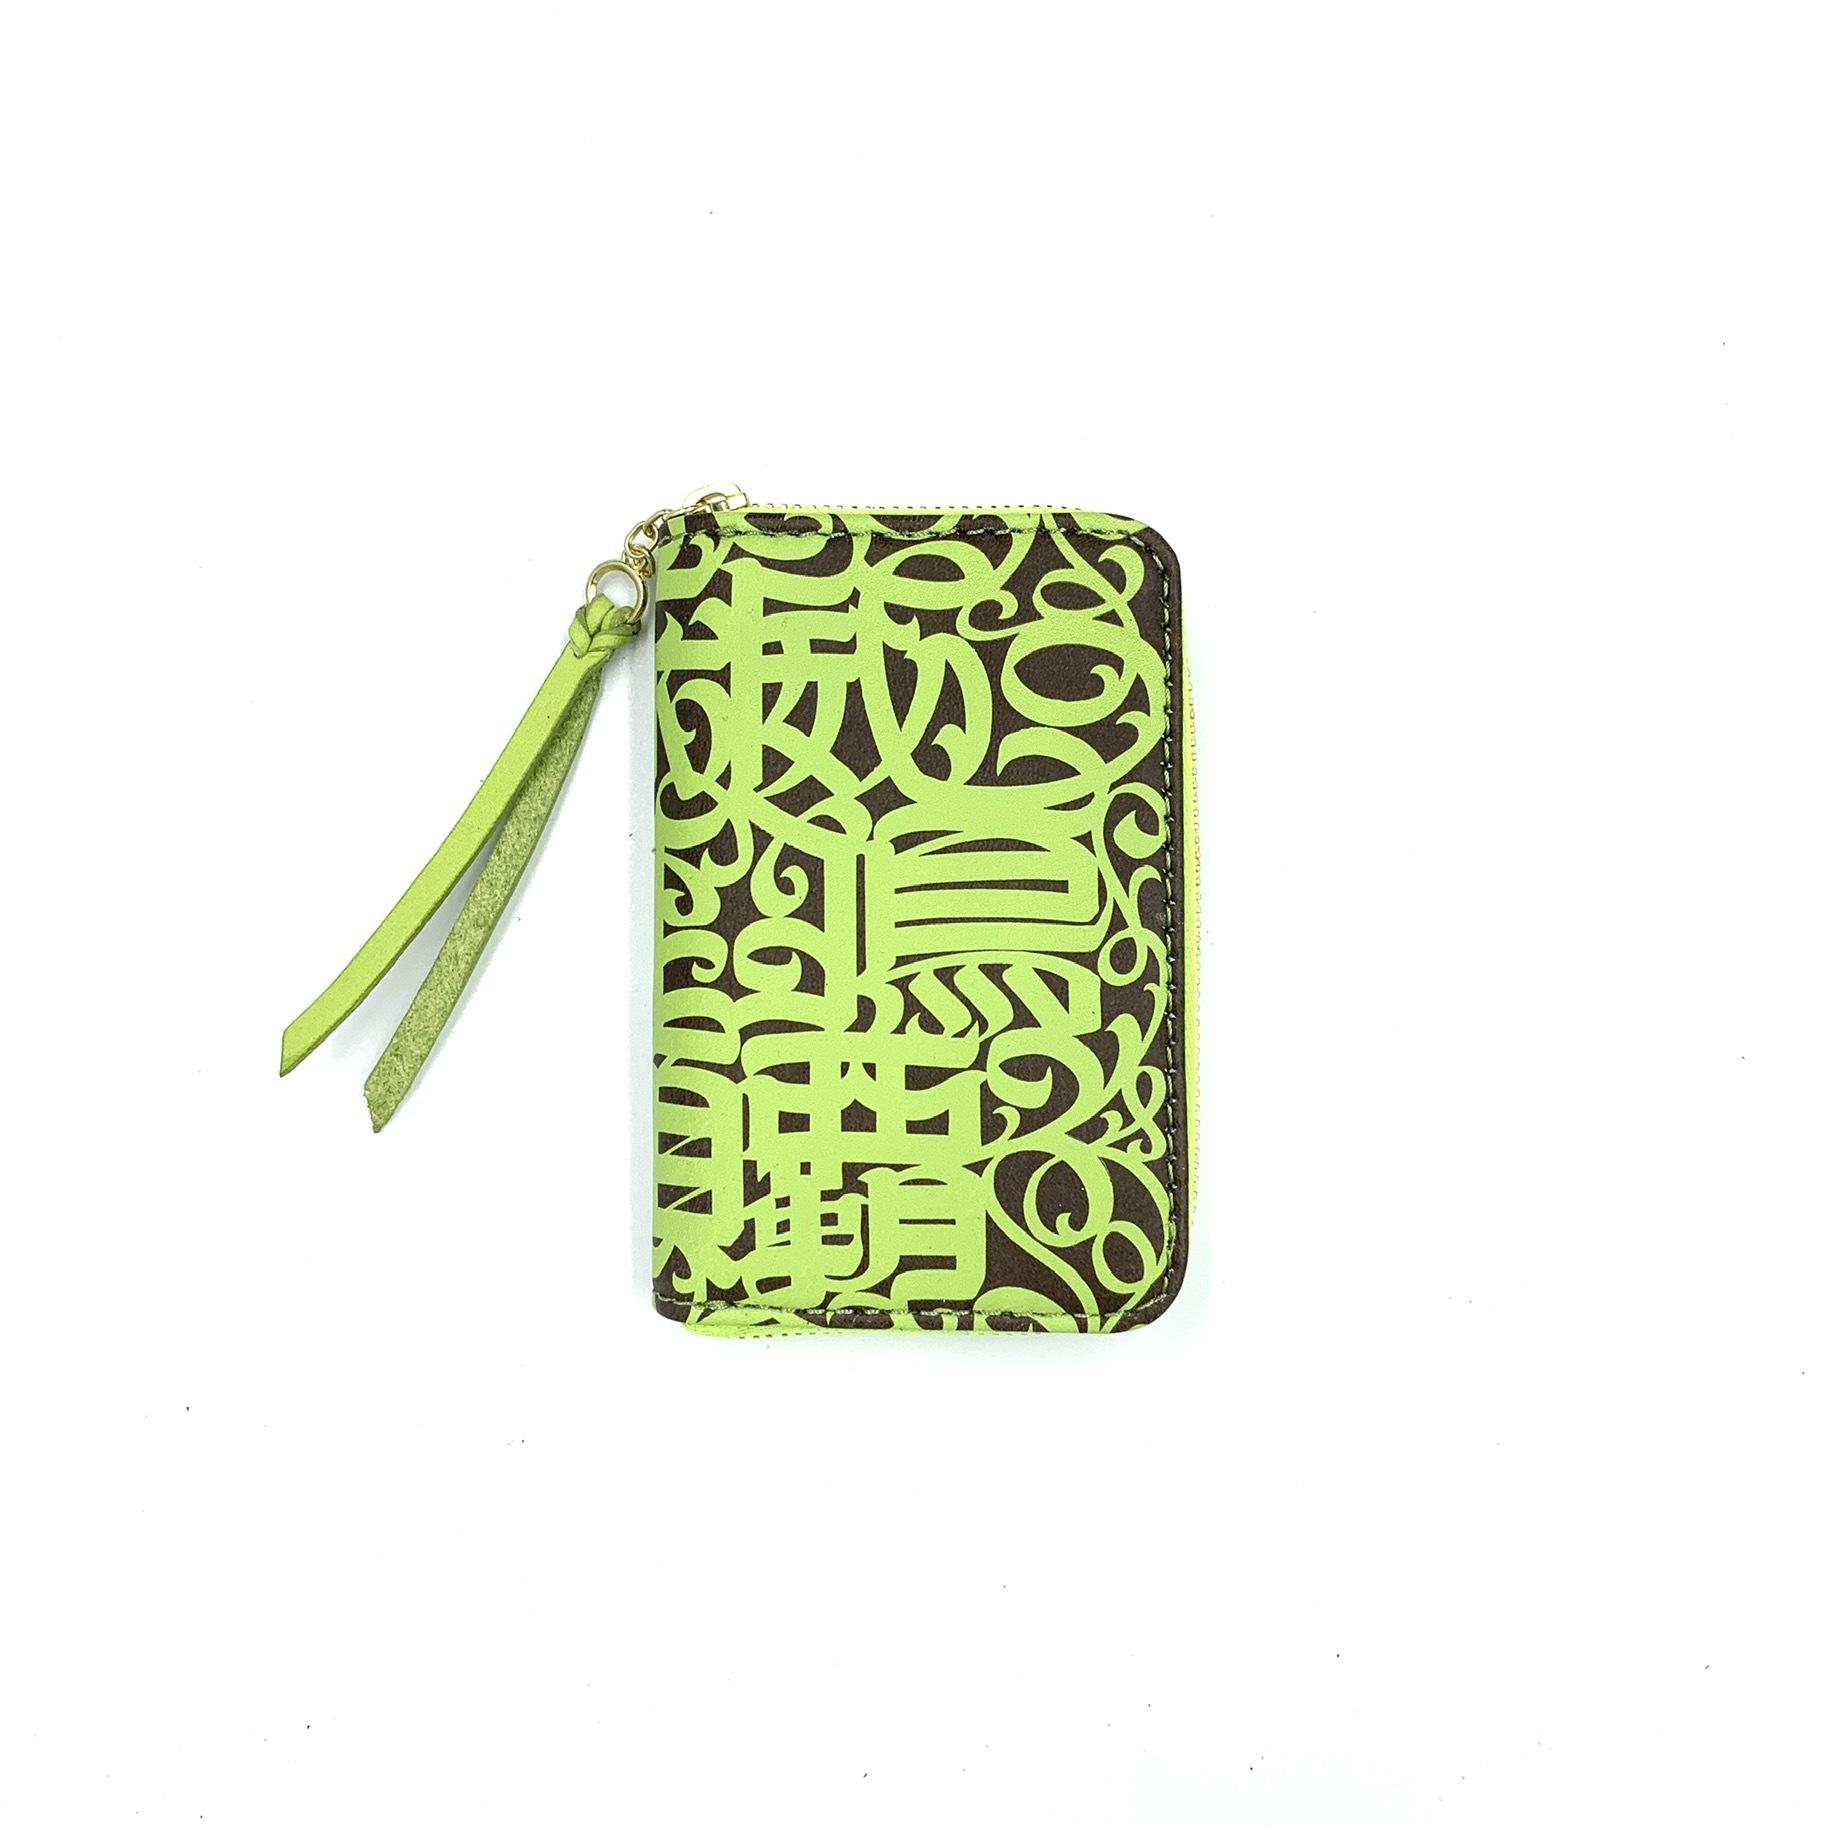 《CASPER× YONZY factory》RZ mini Card Case  ライムグリーン